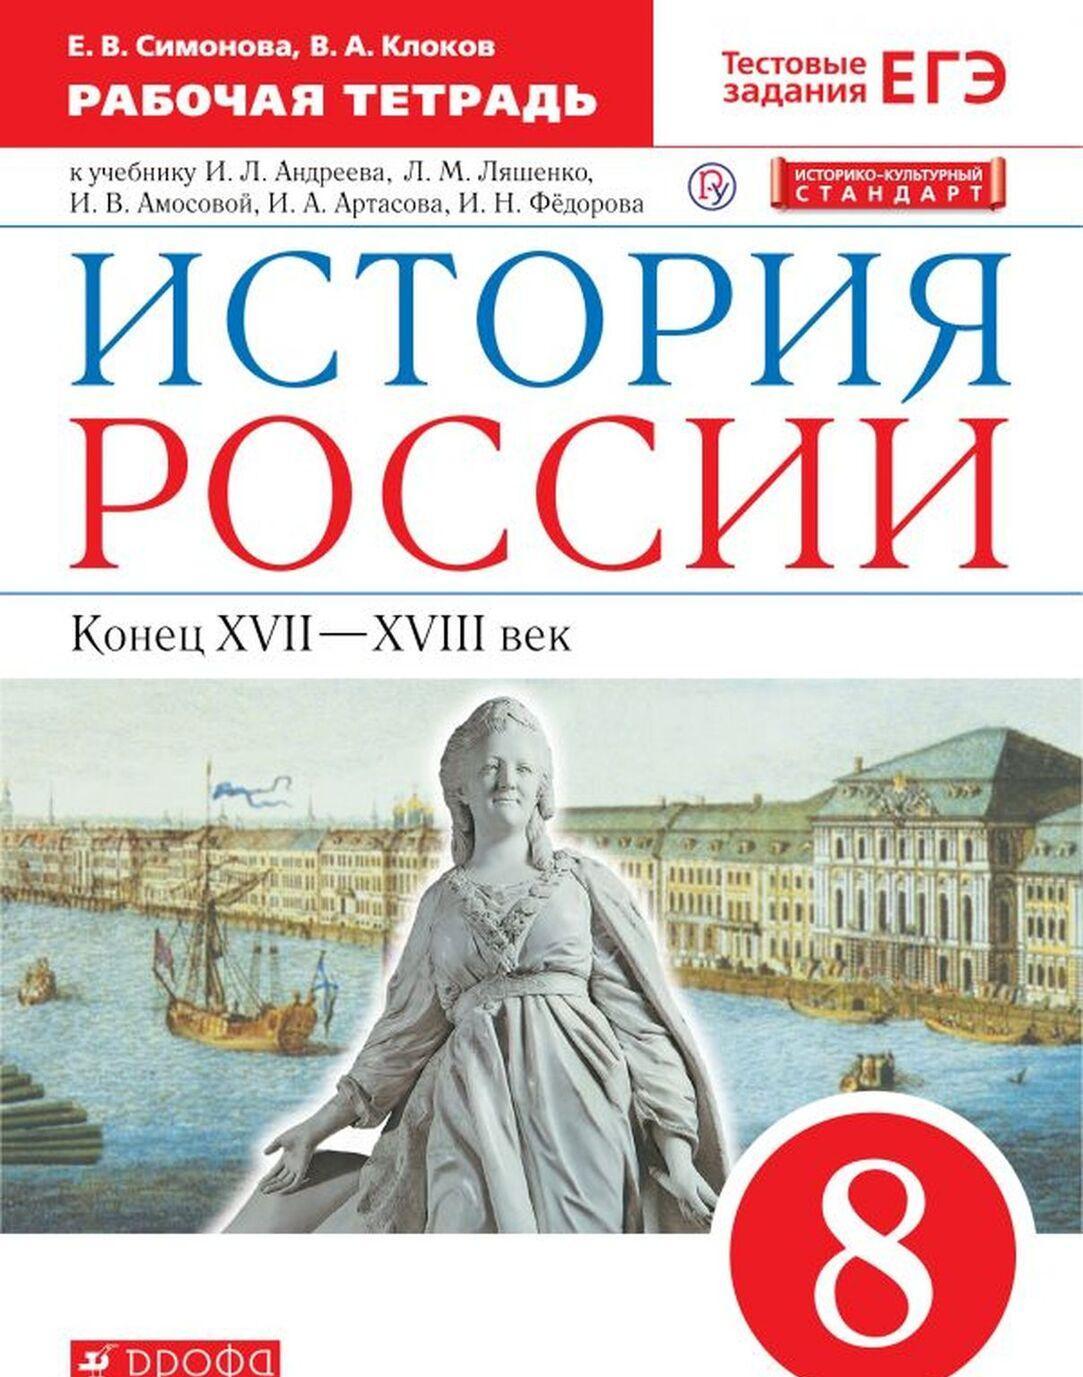 Istorija Rossii.  Konets XVII-XVIII vek. 8 klass. Rabochaja tetrad. K uchebniku I. L. Andreeva i dr.